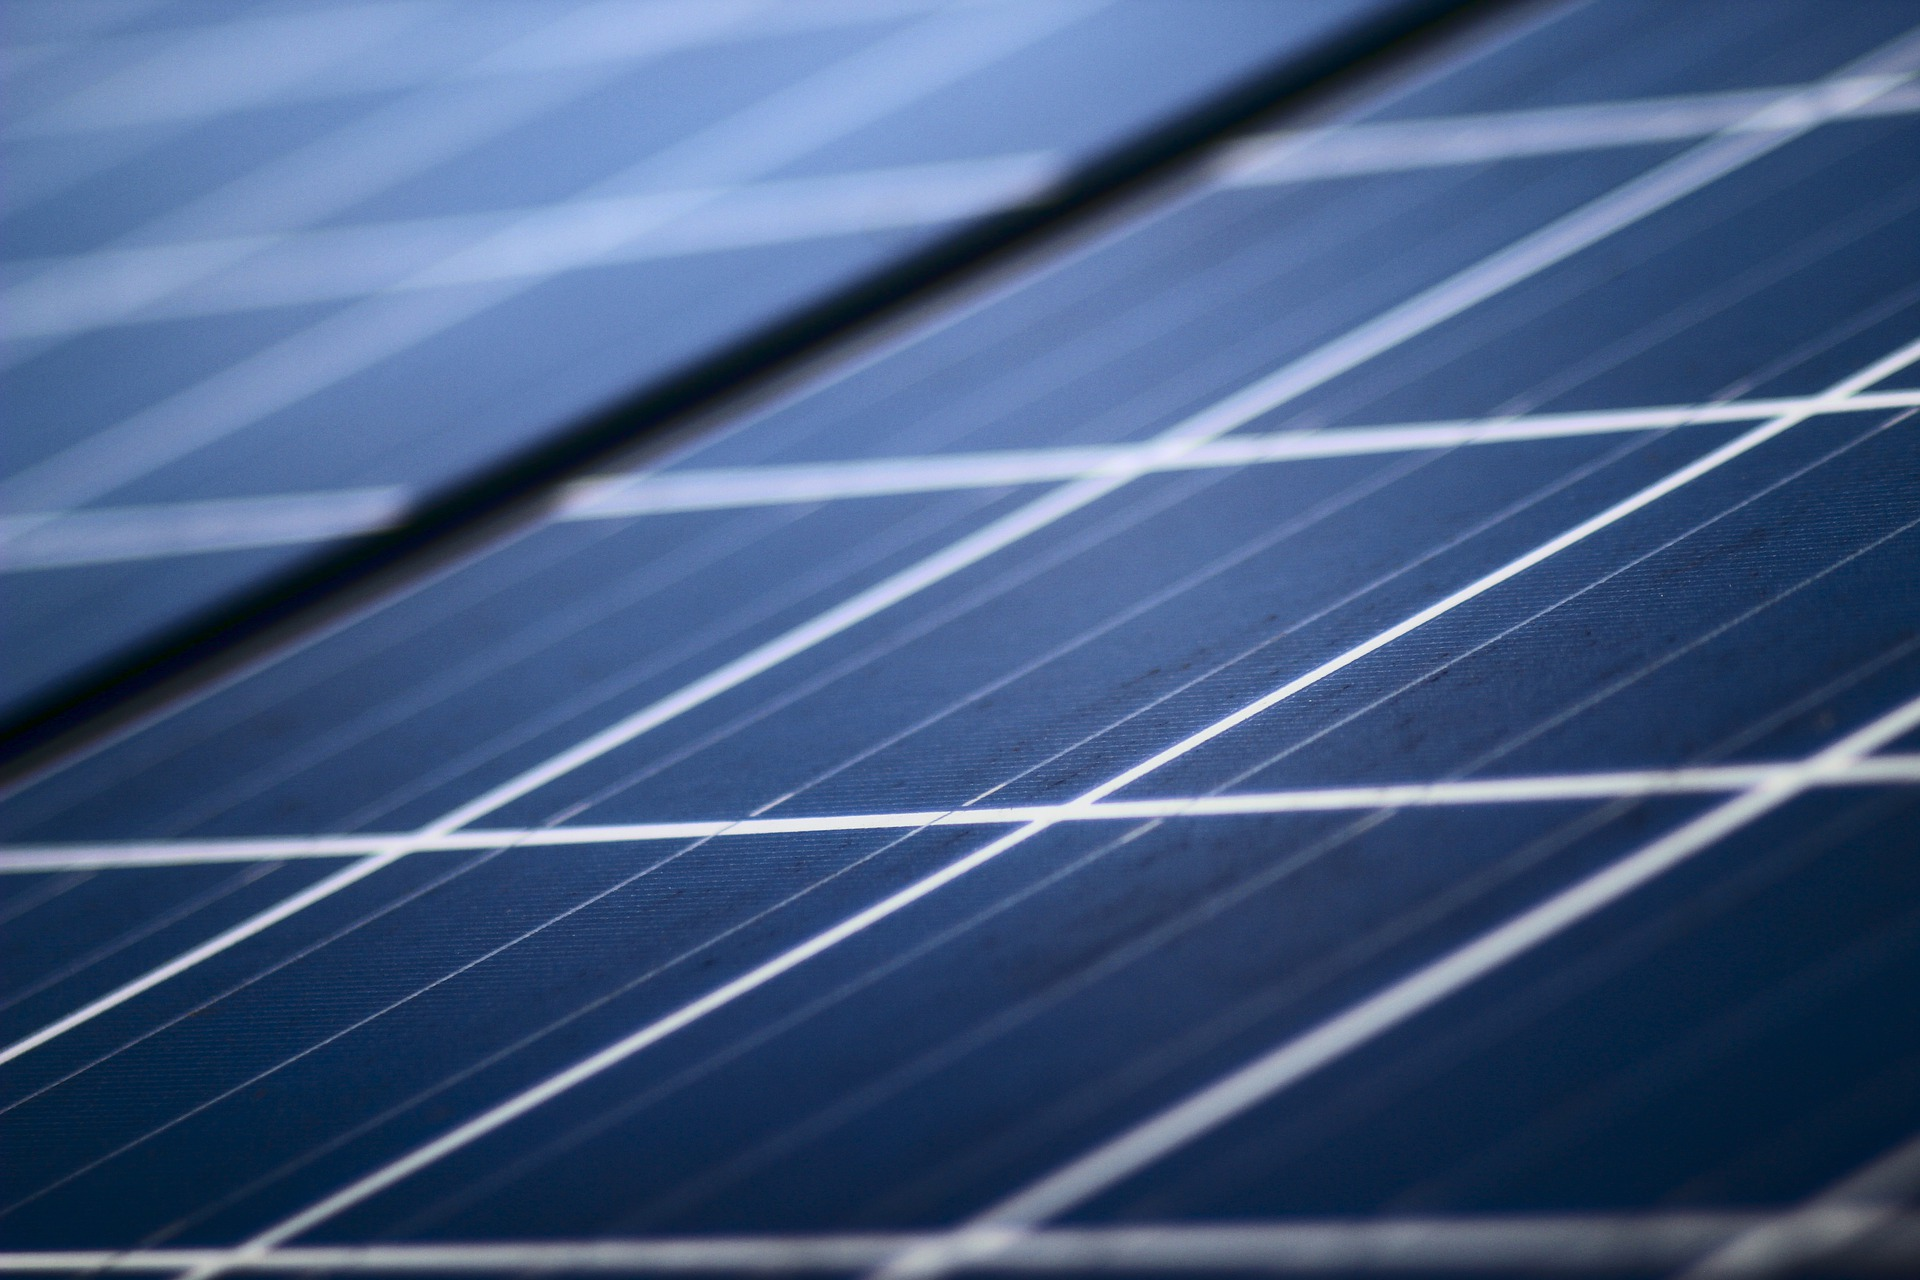 Zur Sonne - Photovoltaik / Pixabay